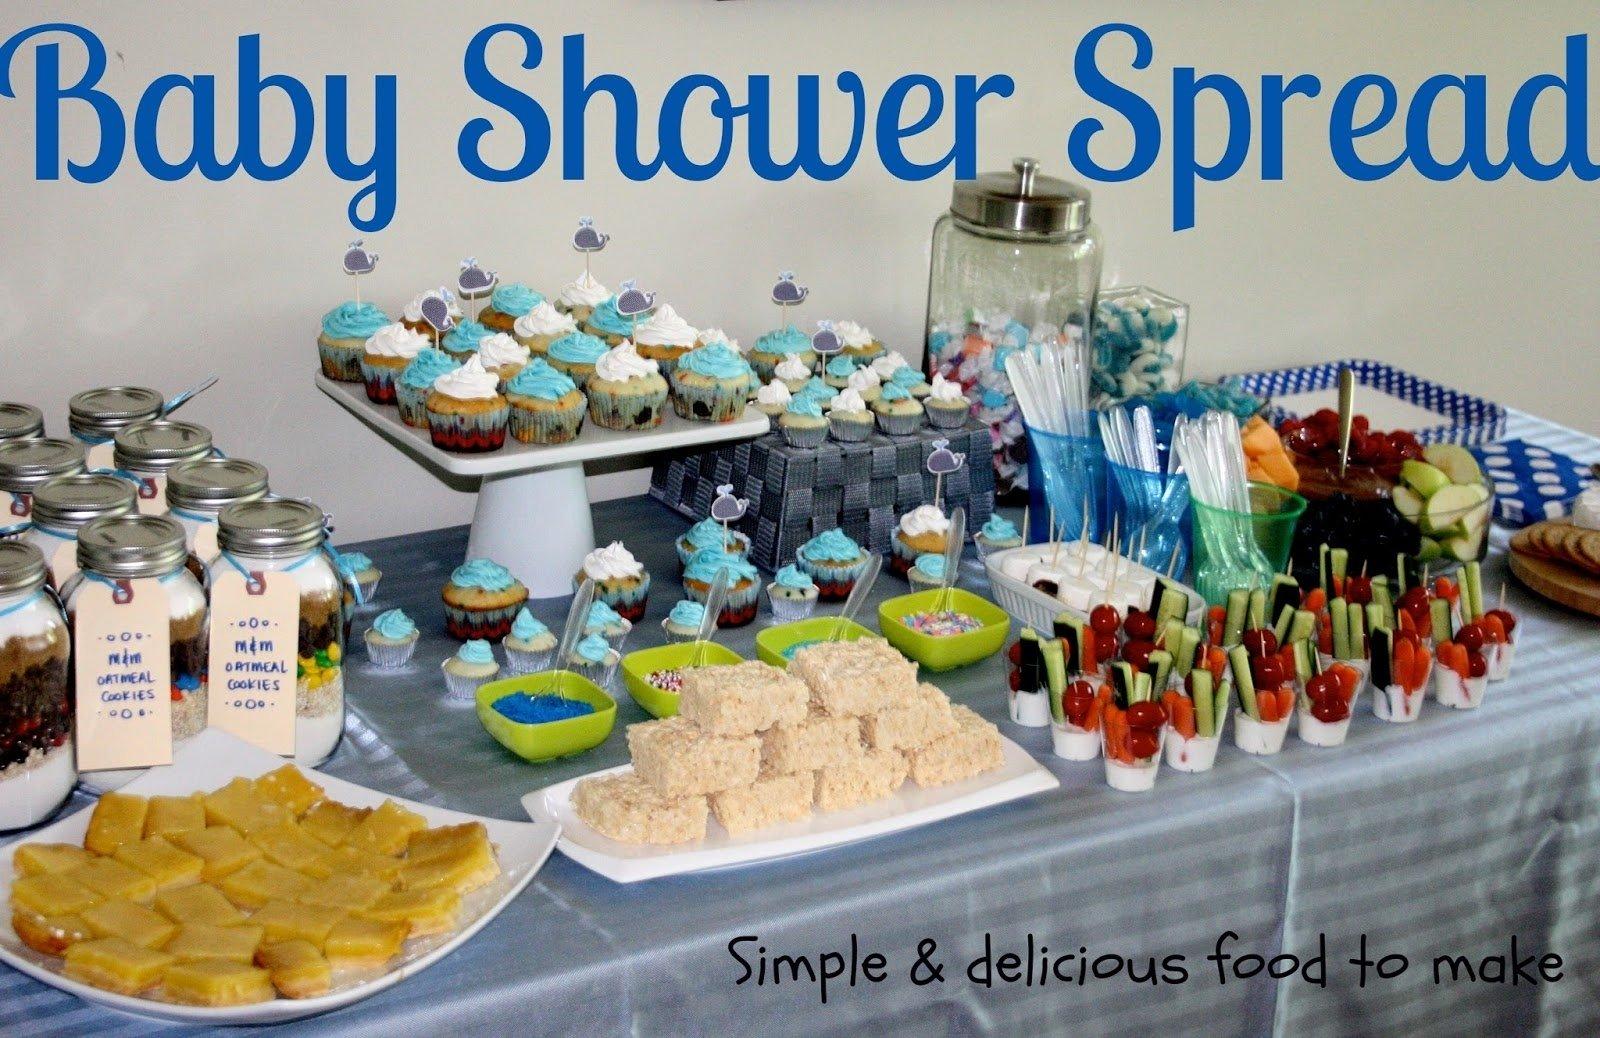 10 Famous Baby Boy Shower Food Ideas splendid baby boy shower ideas and decorations beautiful food